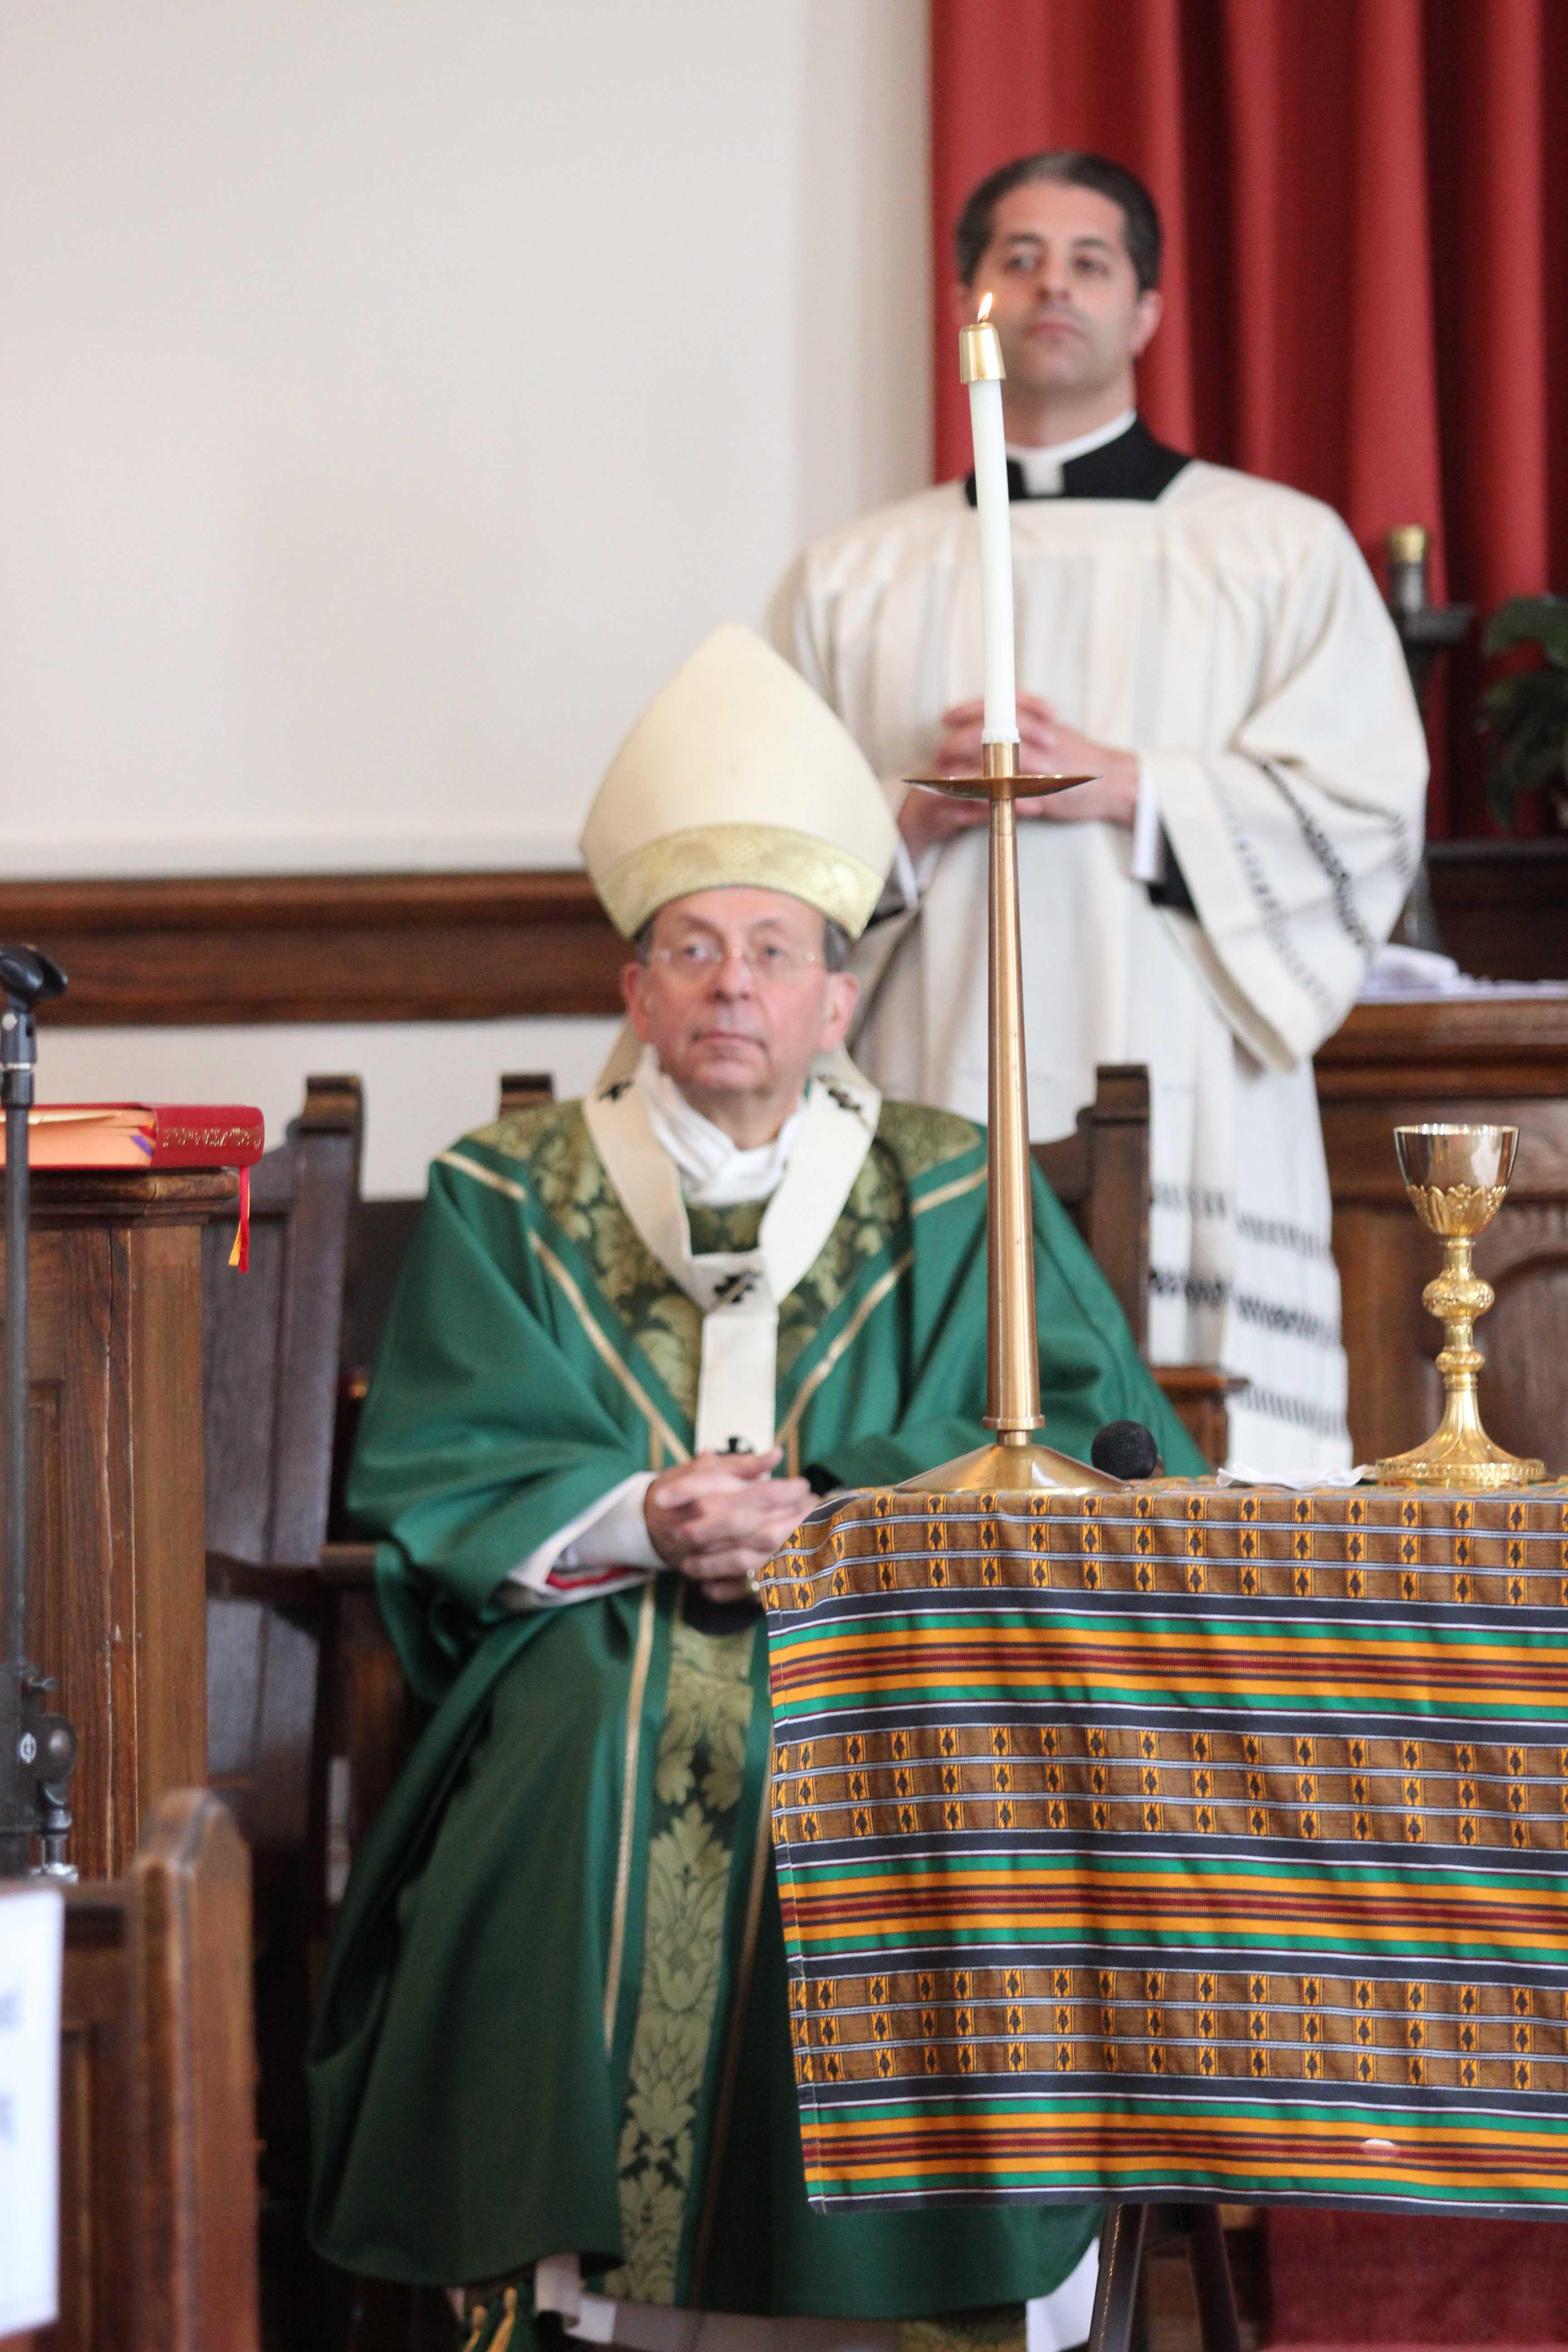 William Lori, the Archbishop of Baltimore, at Sunday mass in Morgan State University's chapel. Photo by Wyman Jones.